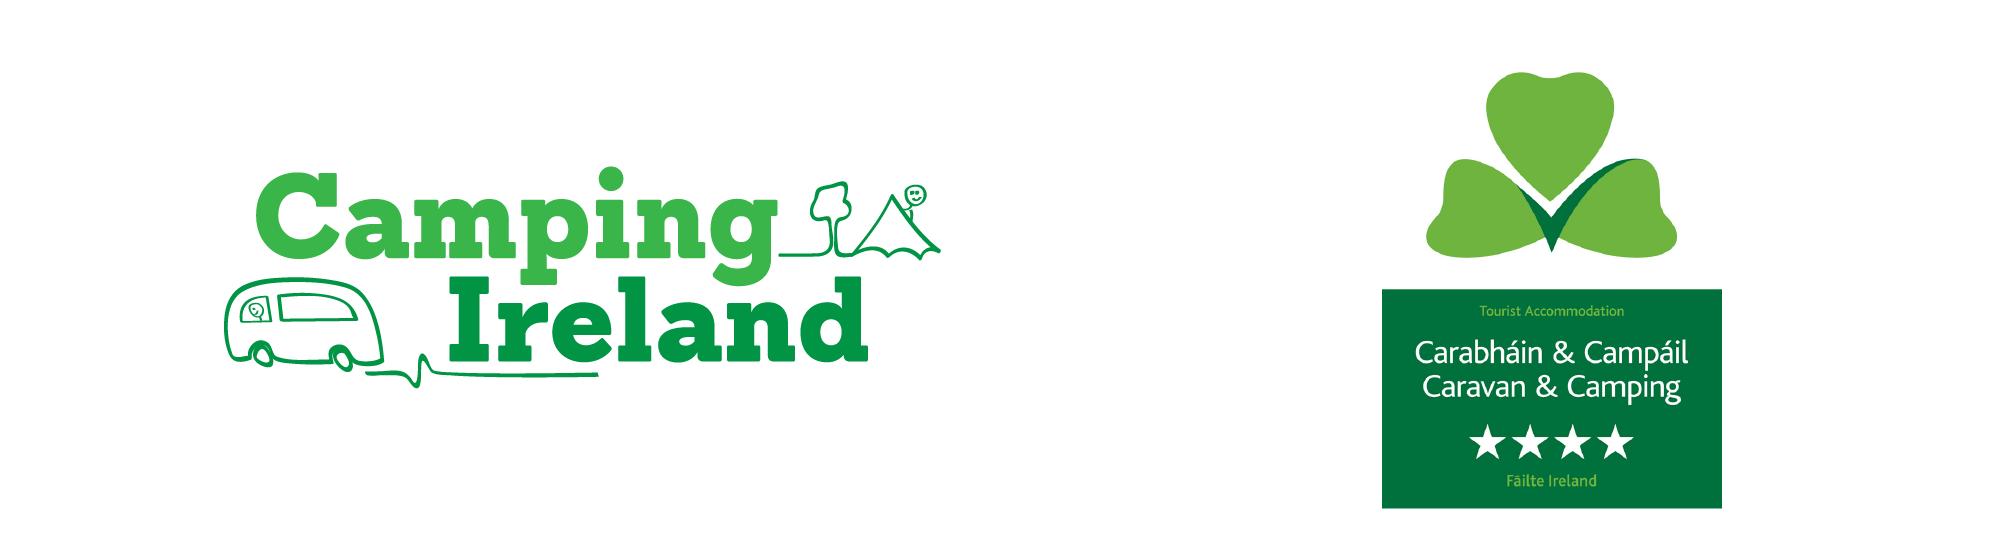 morriscastle strand partner logos camping ireland caravan